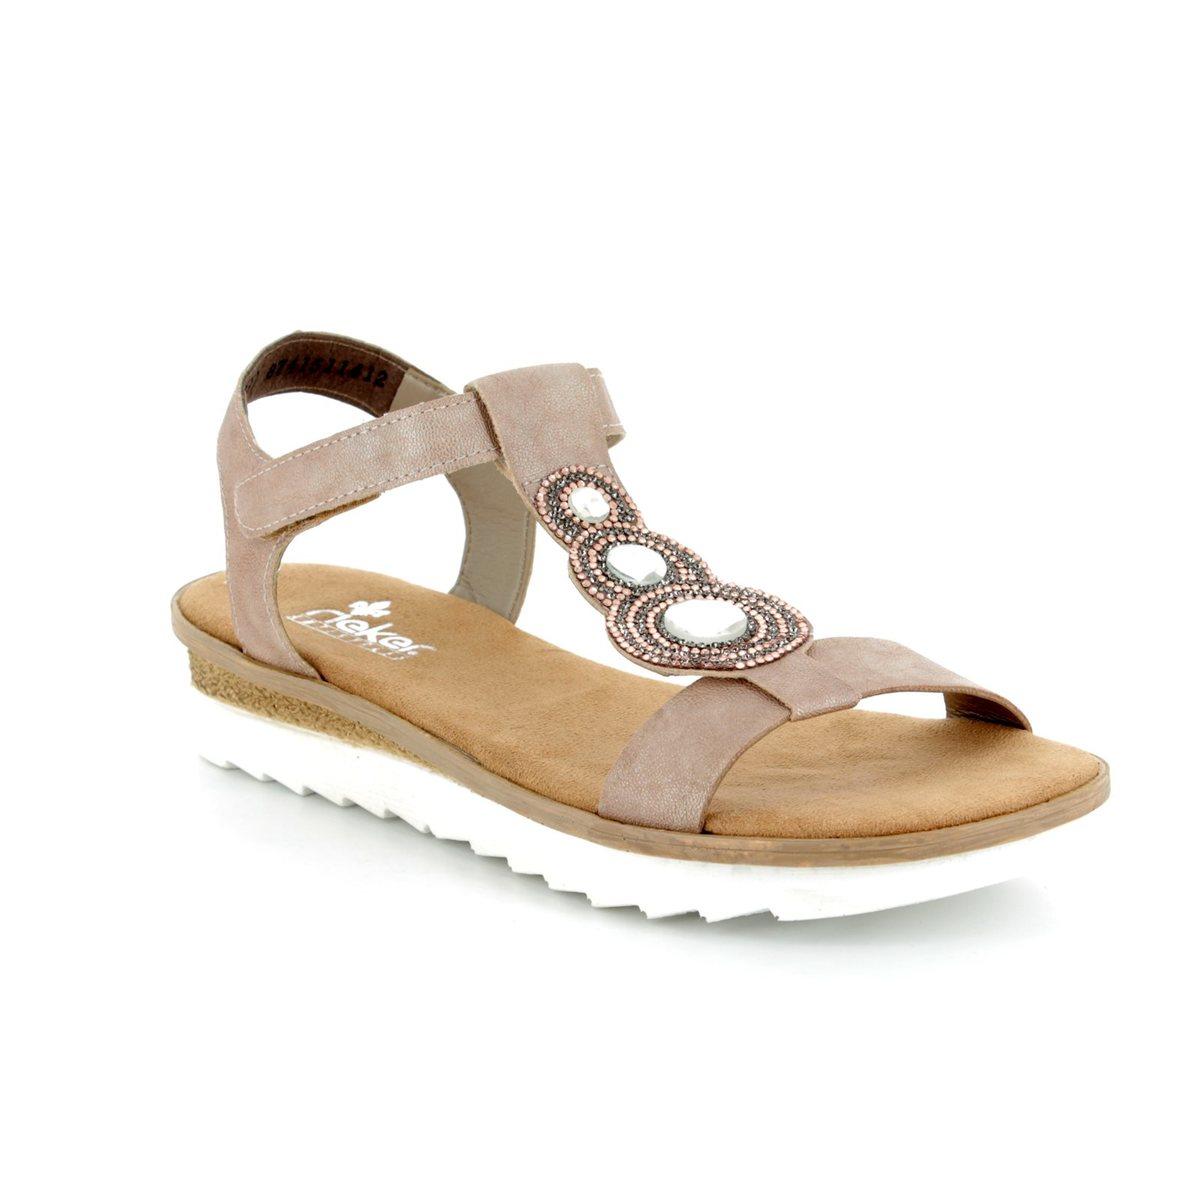 2fb89593c Rieker Sandals - Pink - 63184-62 TIDE